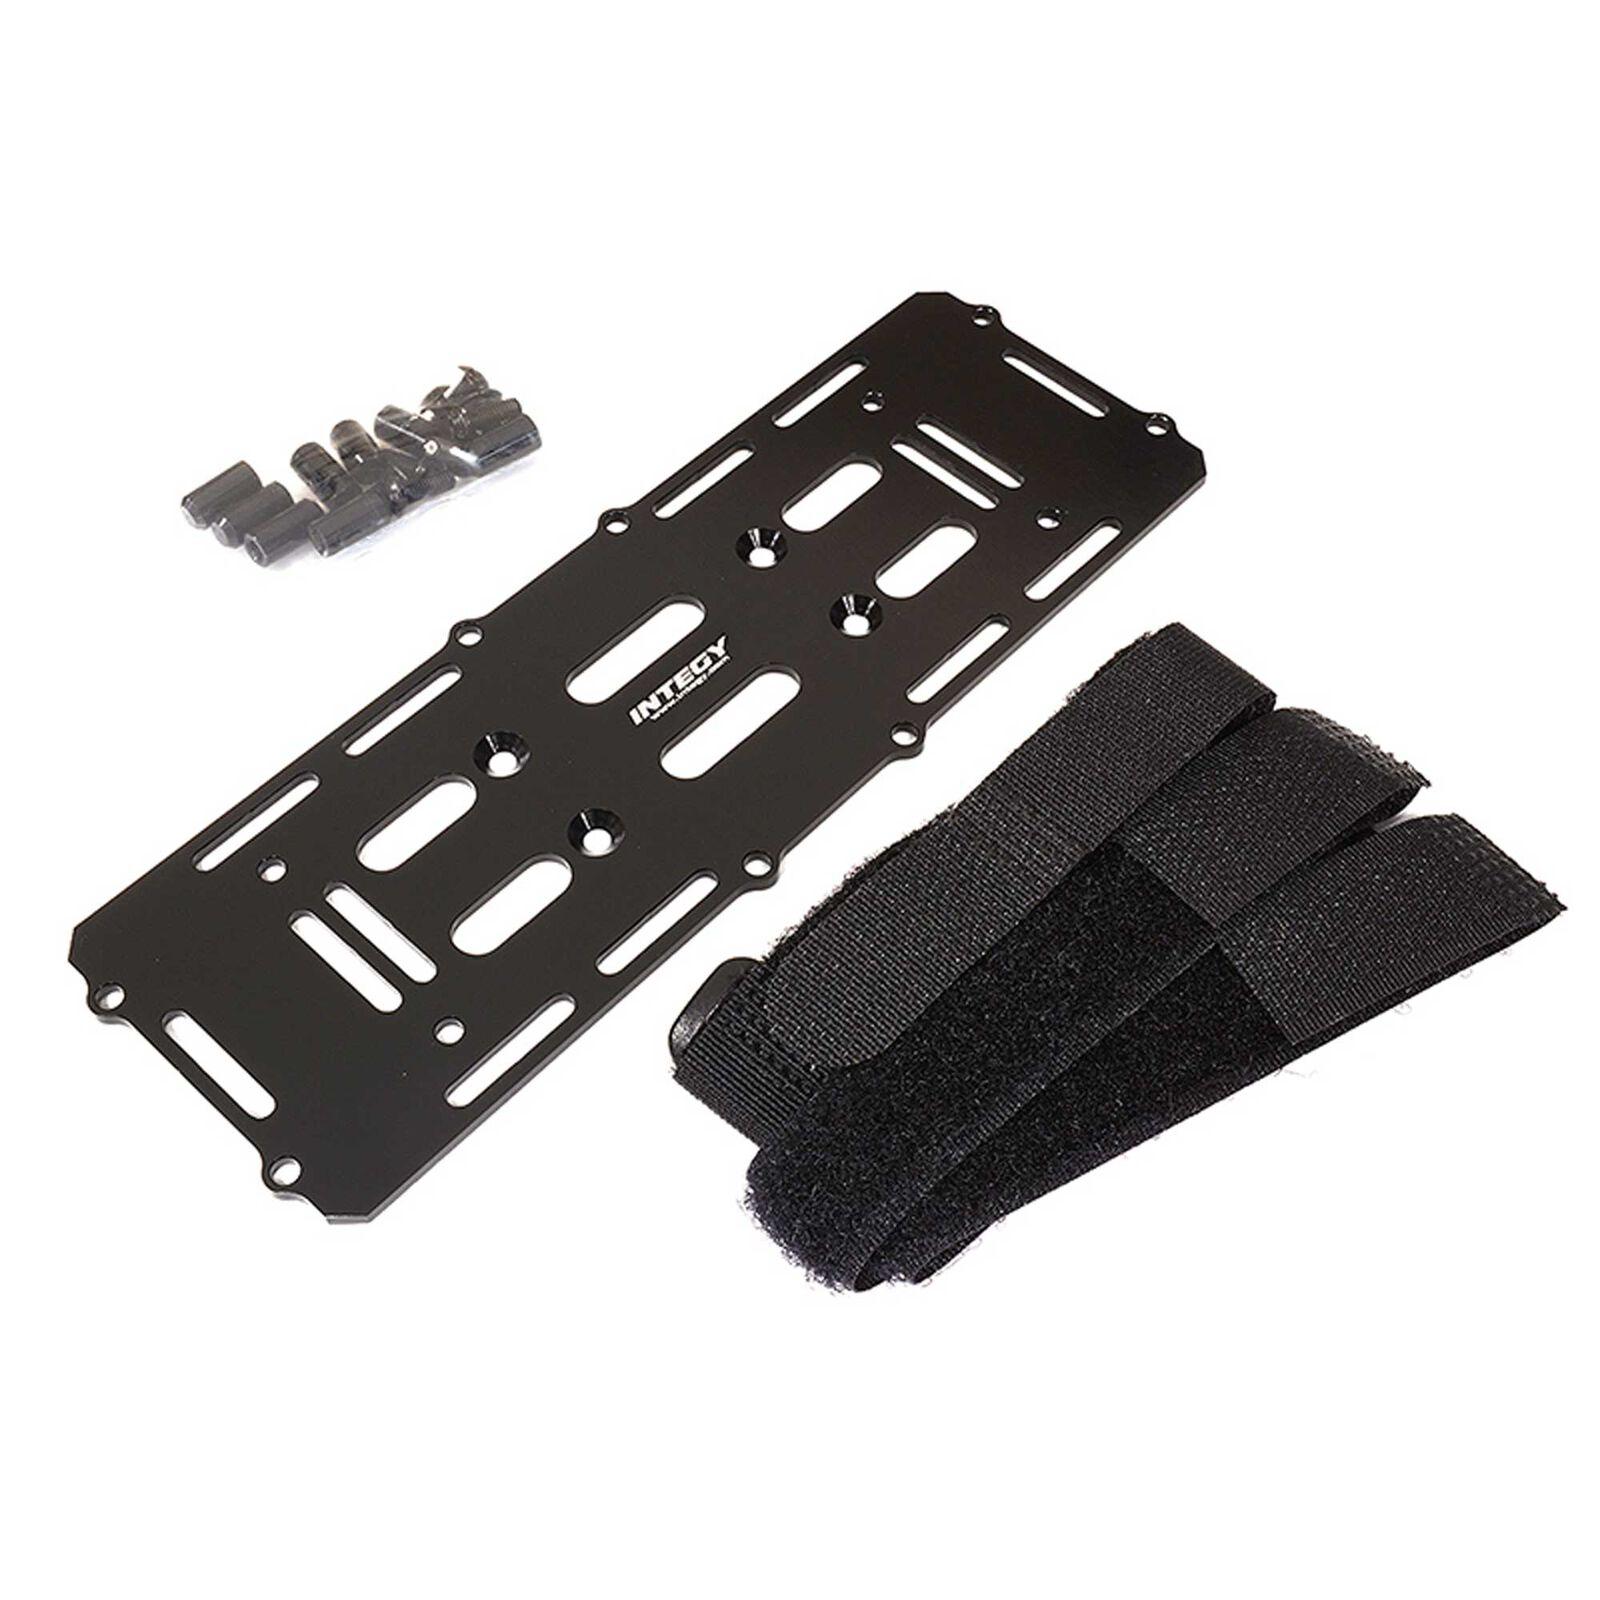 Battery Mounting Plate, Black: 1/10 Enduro Sendero